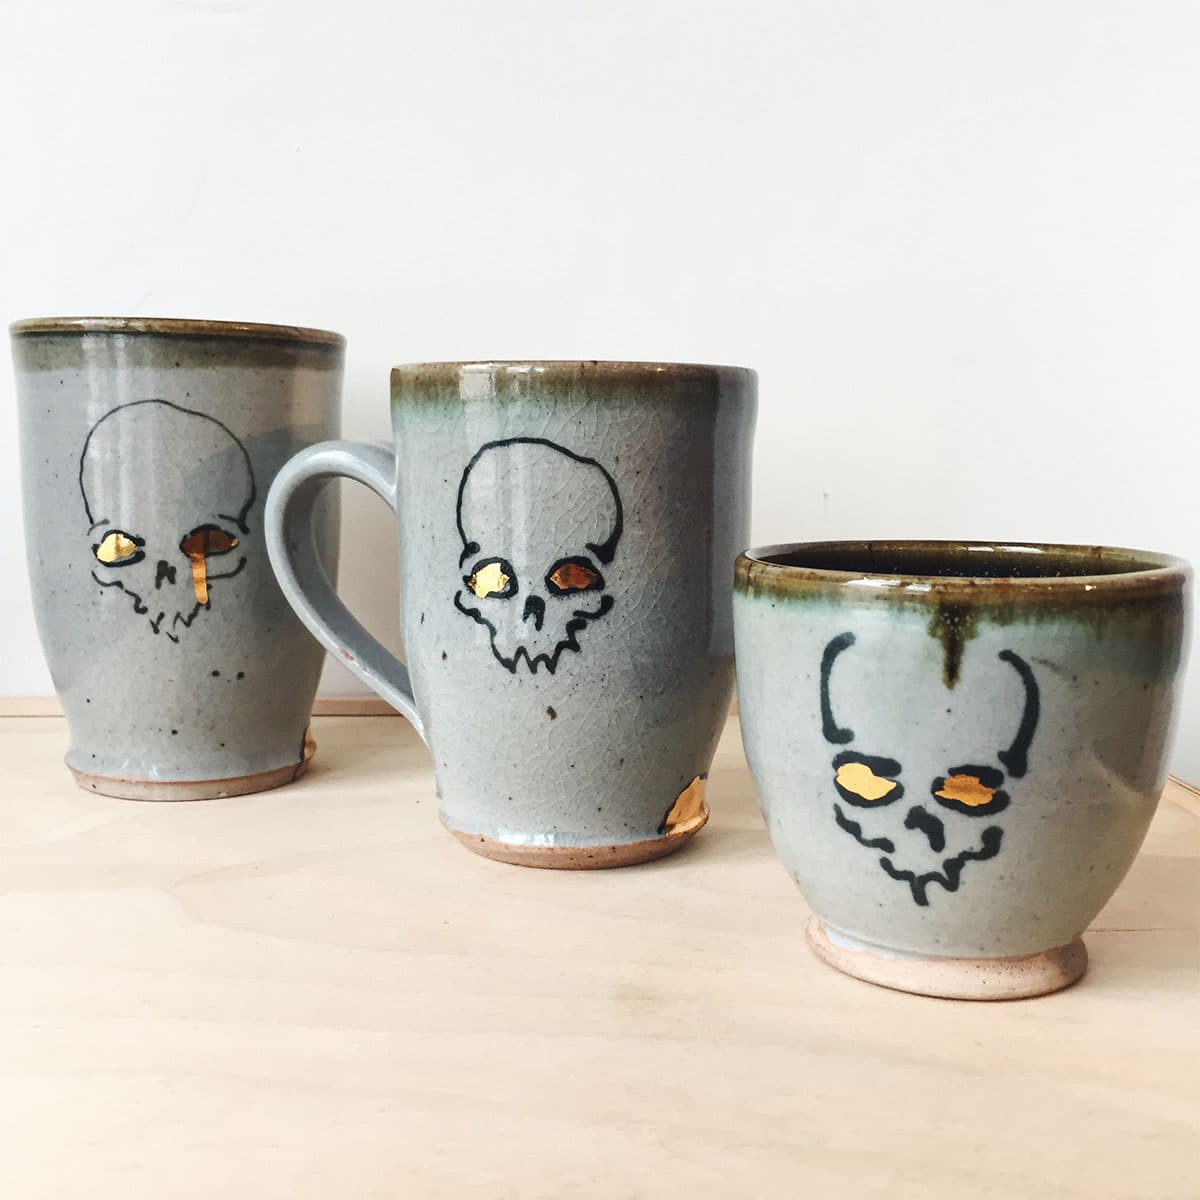 Skull mugs from local ceramicist Corey Jefferson at Homespun: Modern Handmade